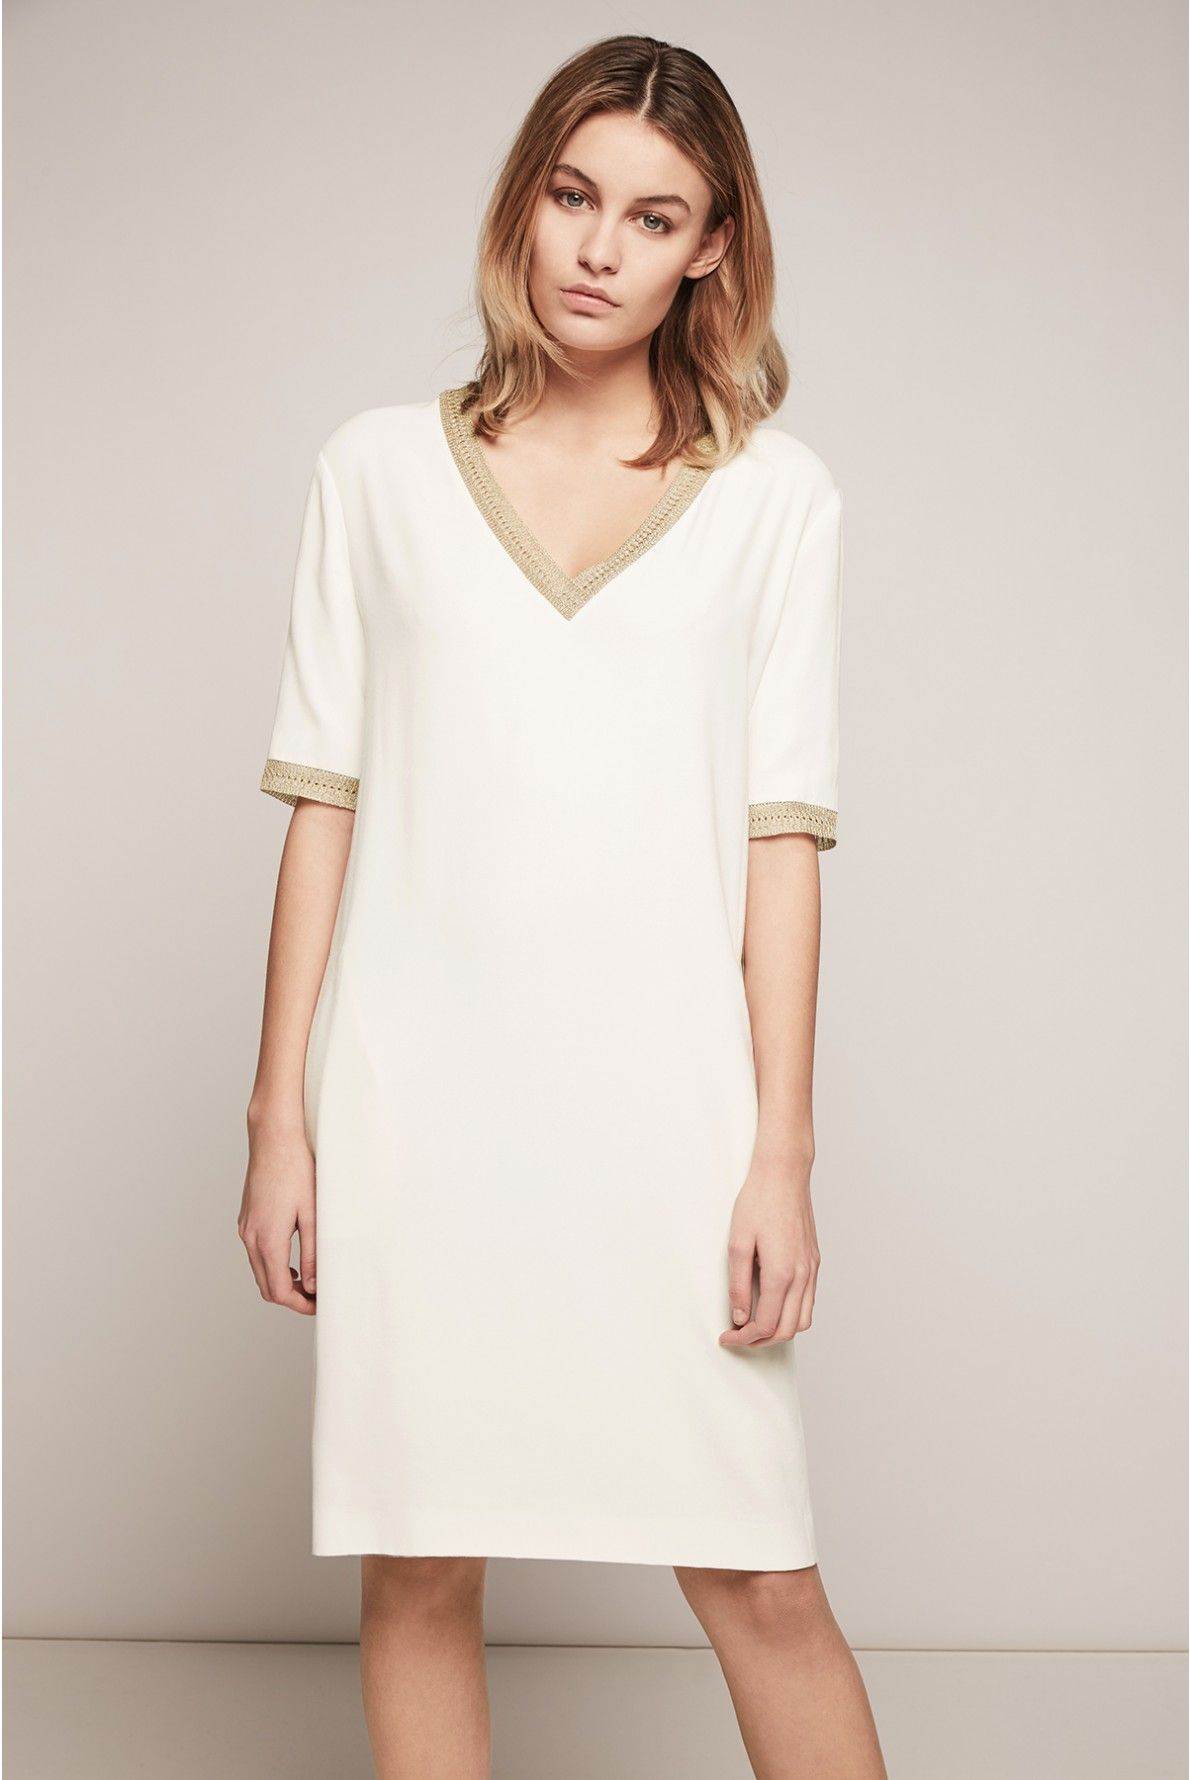 Harmony Dress Ecru Gerard Darel 1